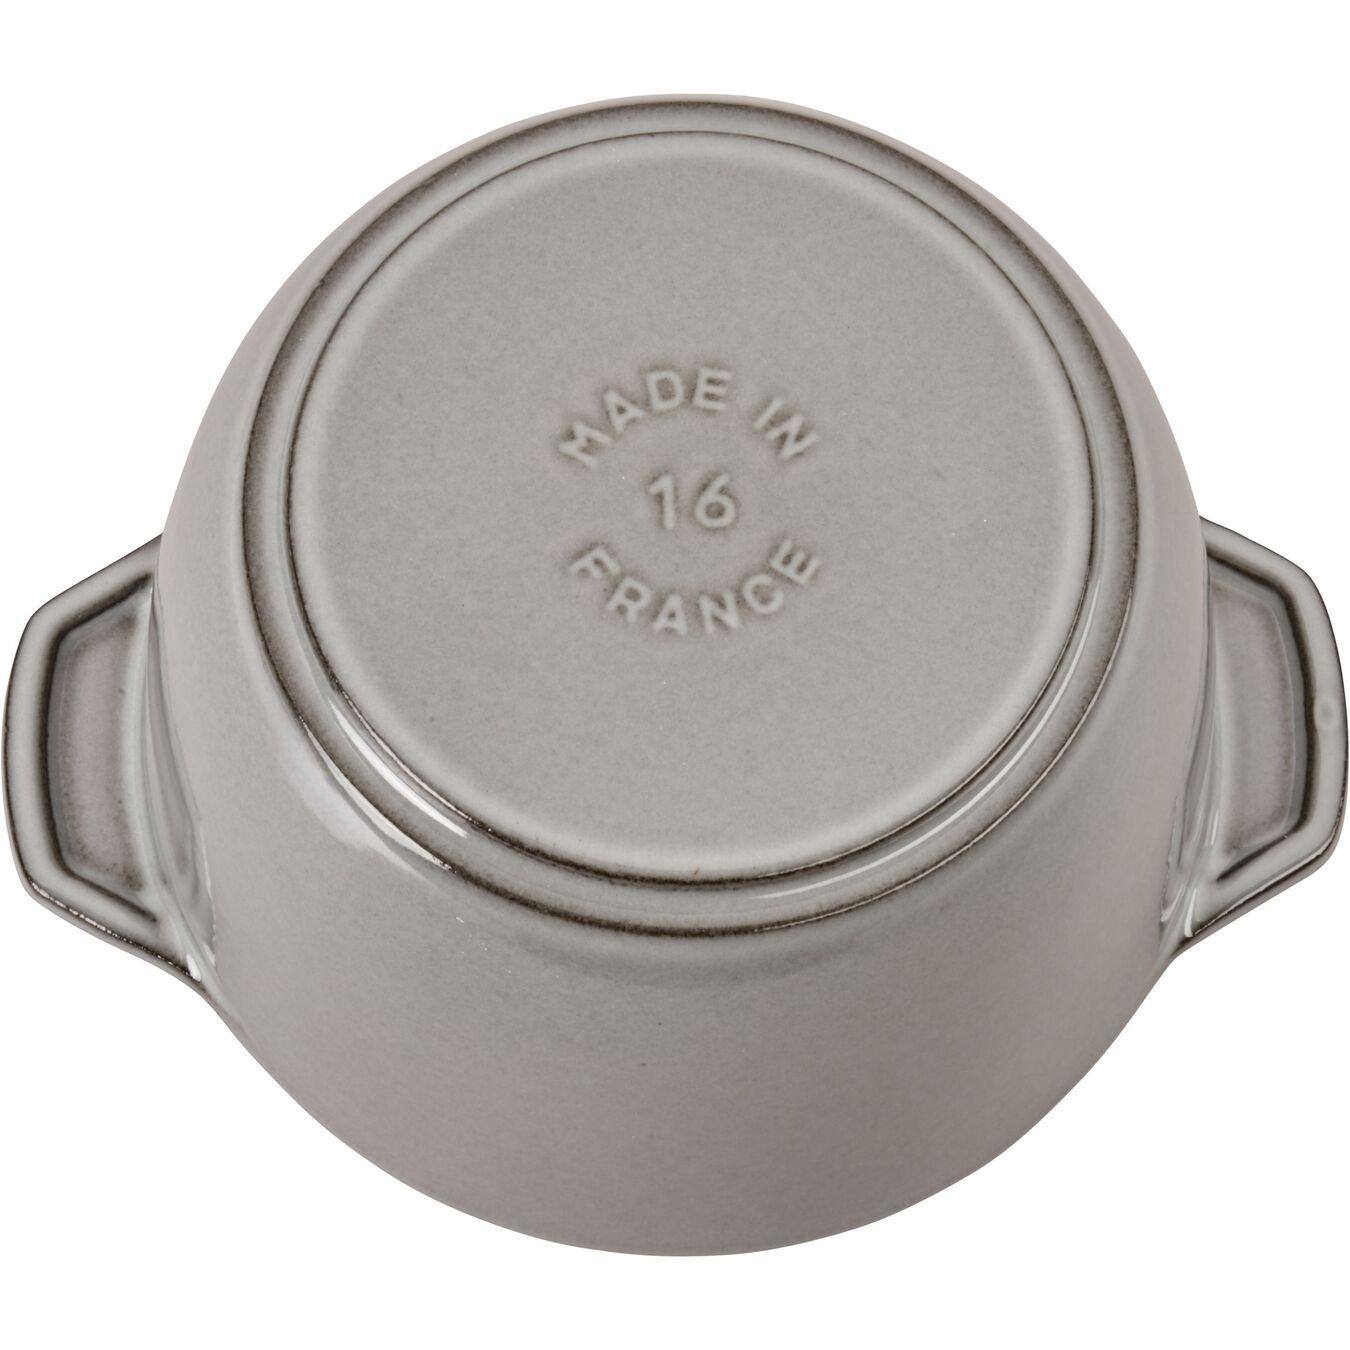 Reis-Cocotte 16 cm, rund, Graphit-Grau, Gusseisen,,large 9